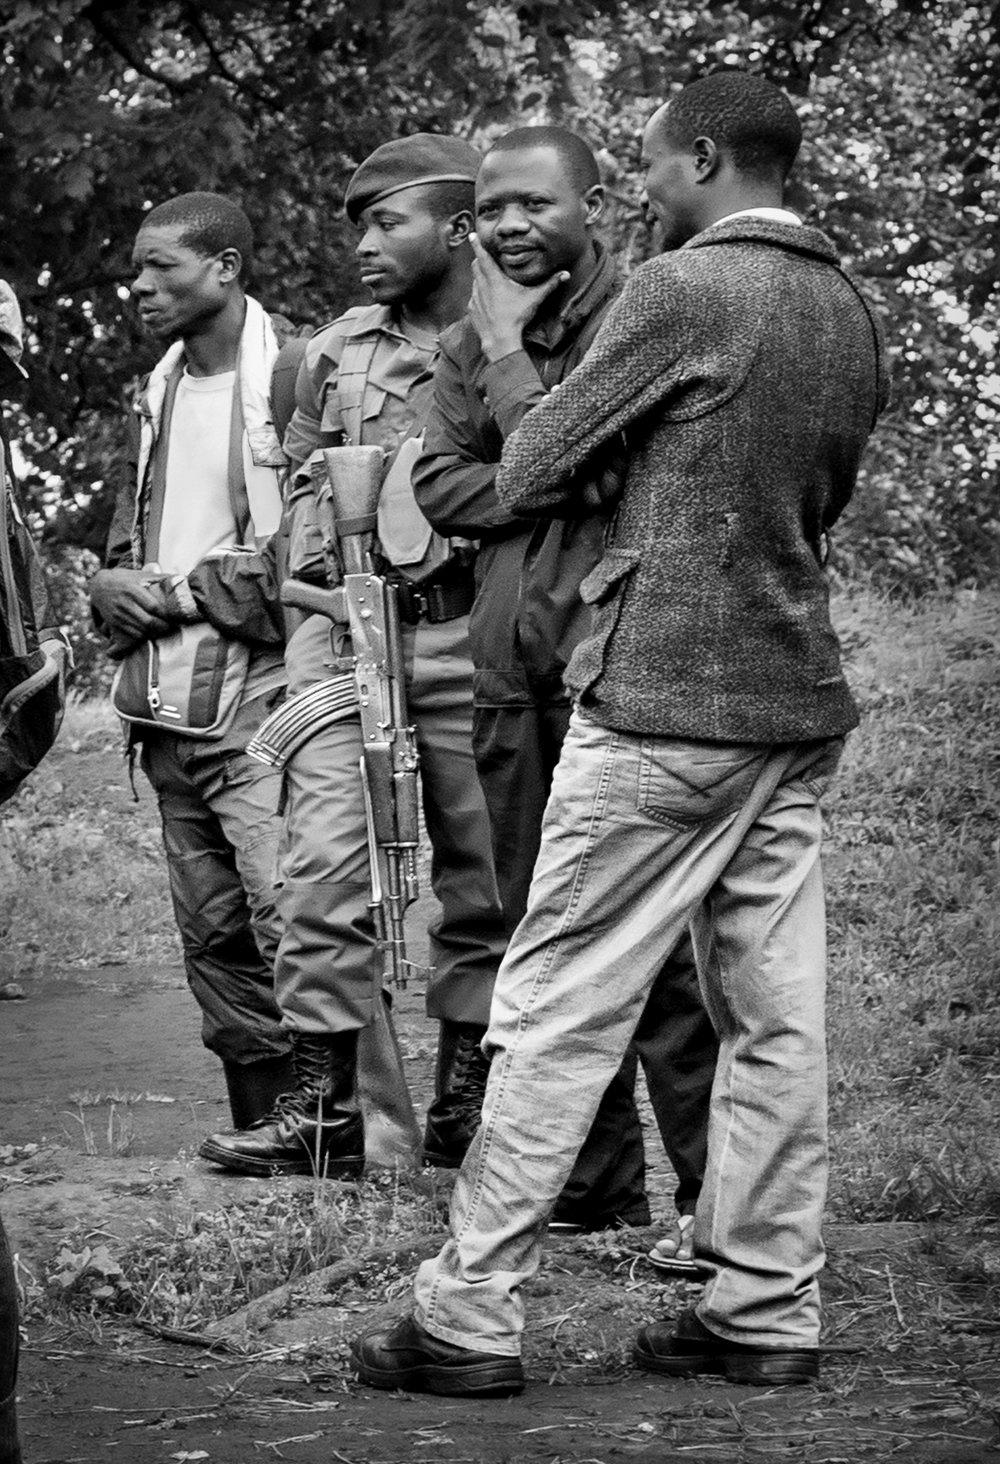 Congo-Series.2.jpg